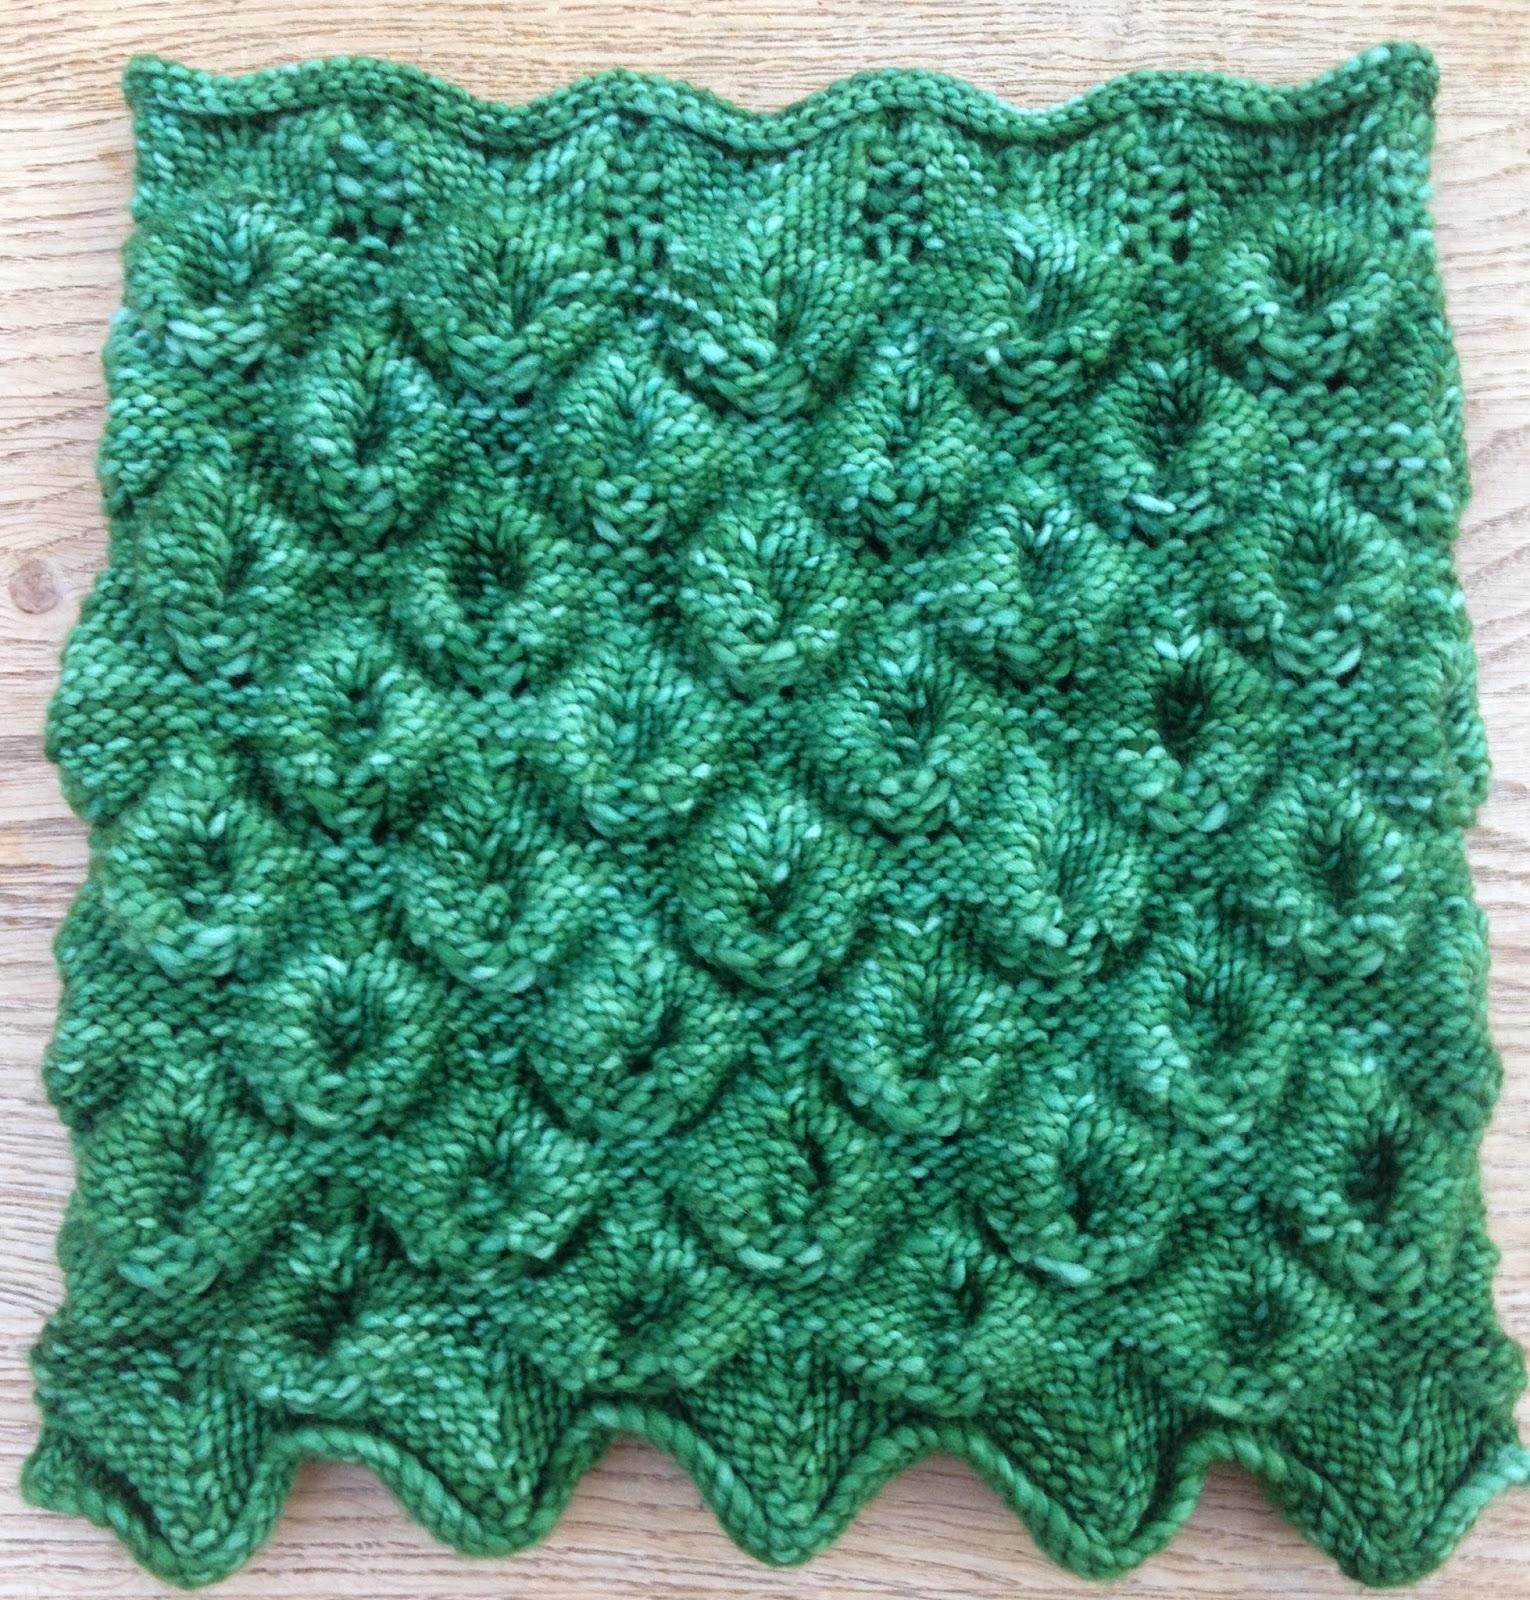 Knitting Yrn P2tog : Emma vining hand knitting my drumlins cowl in the knitter